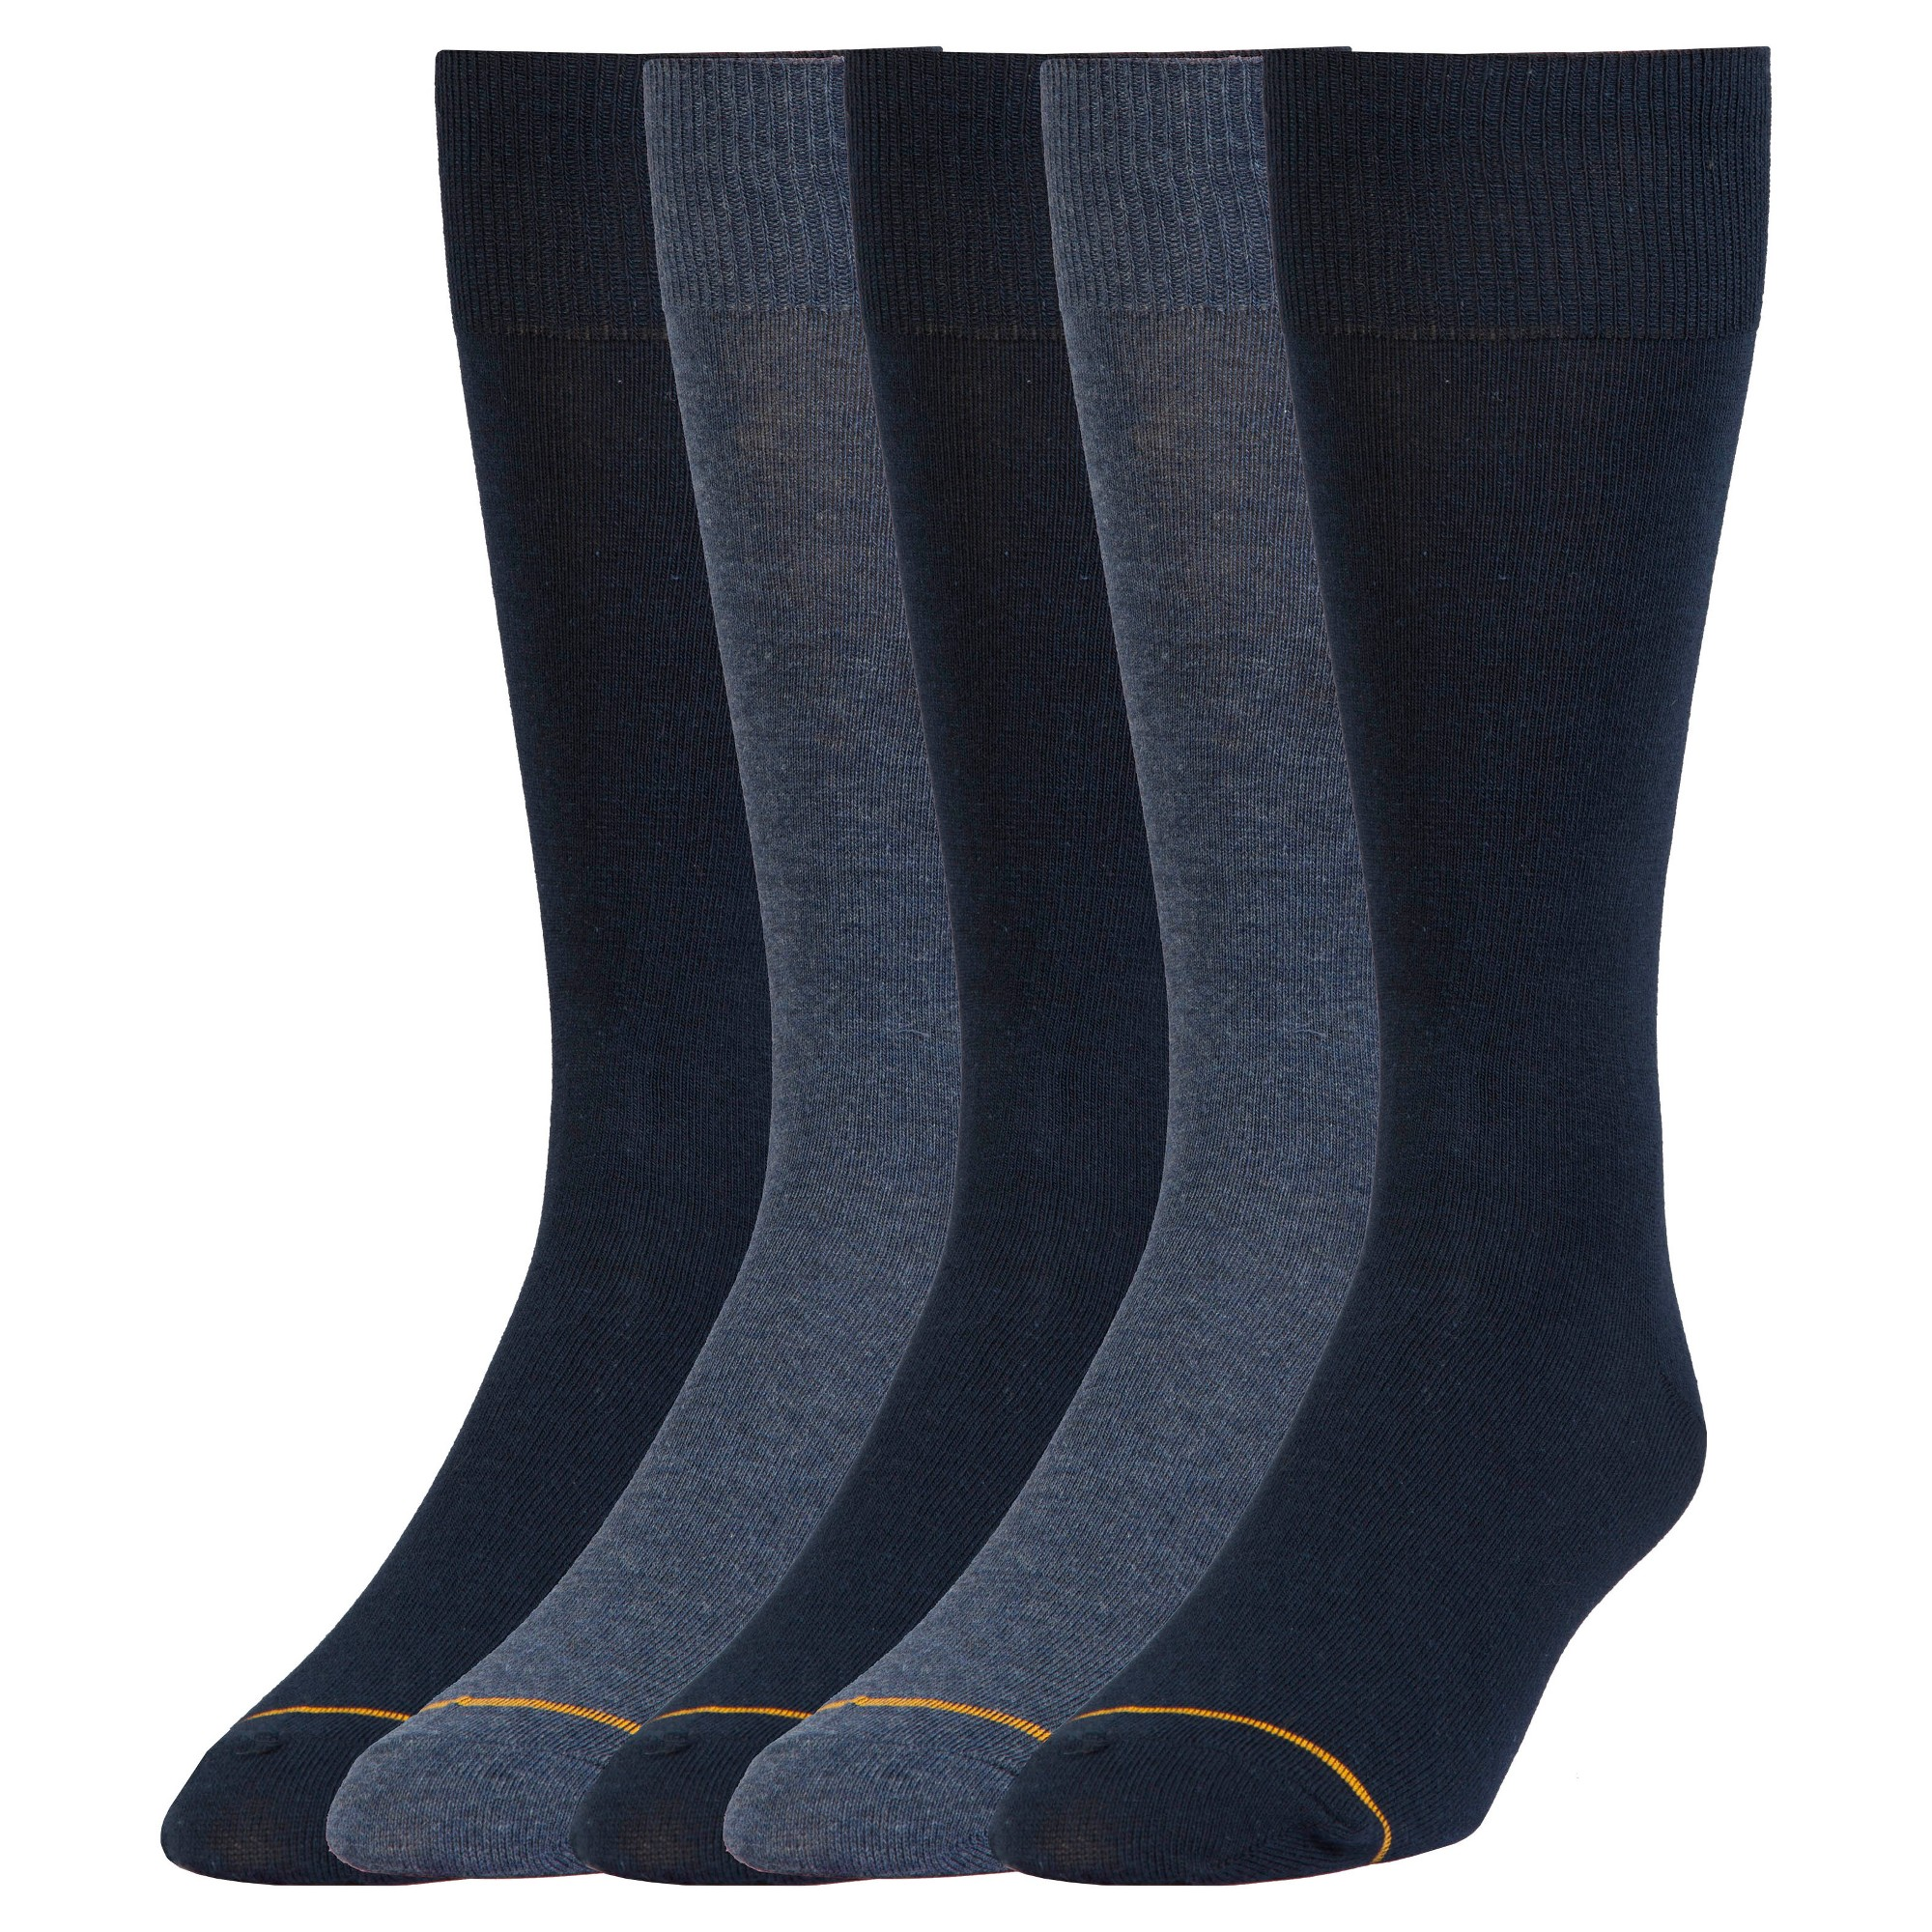 Signature Gold by GOLDTOE Men's Flatknit Crew Socks 5pk - Navy 6-12, Men's, Size: Small, Blue